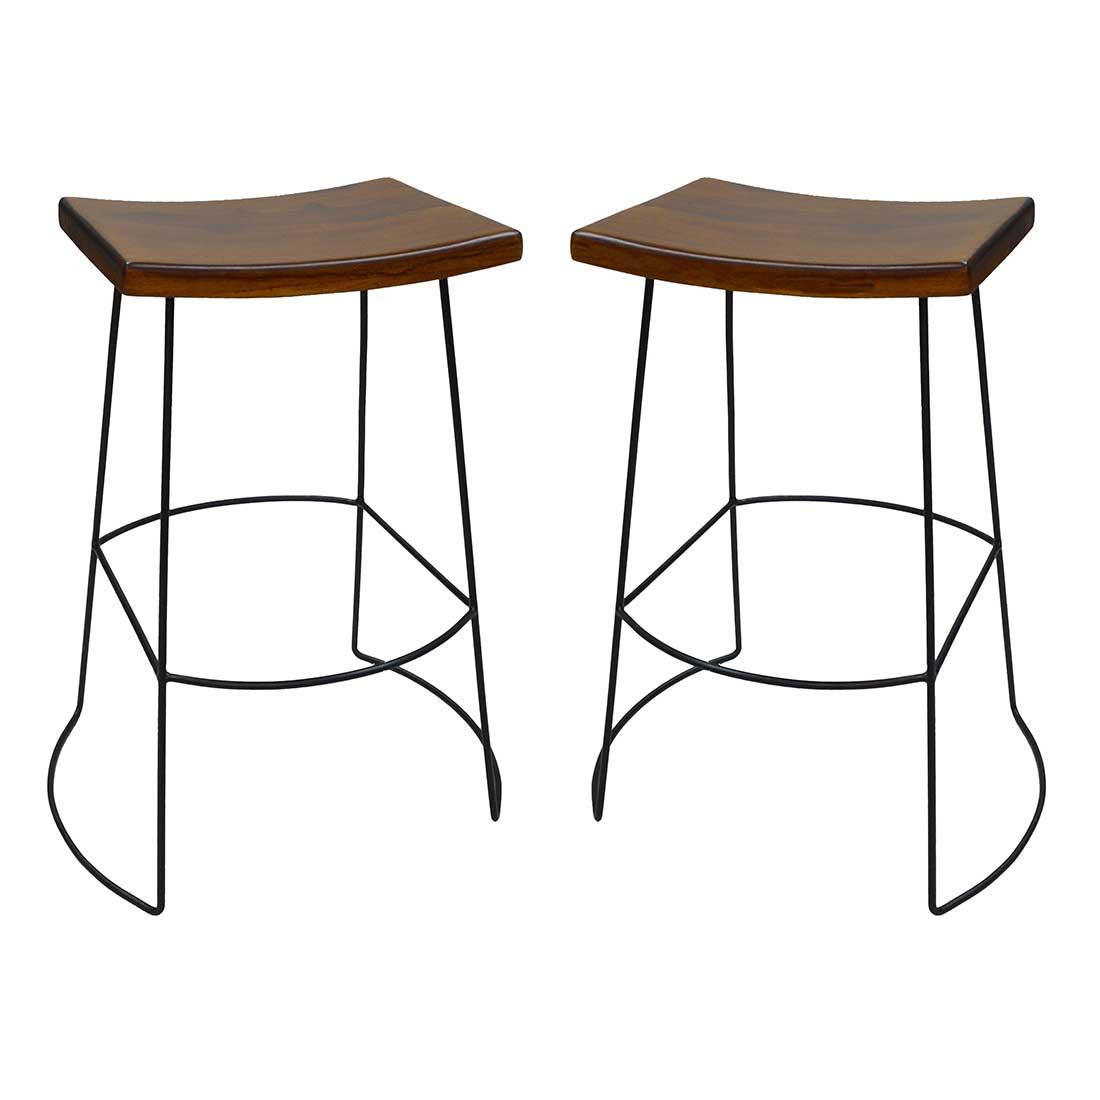 Outstanding Wyatt Saddle Seat Bar Stool Set Of 2 Beatyapartments Chair Design Images Beatyapartmentscom